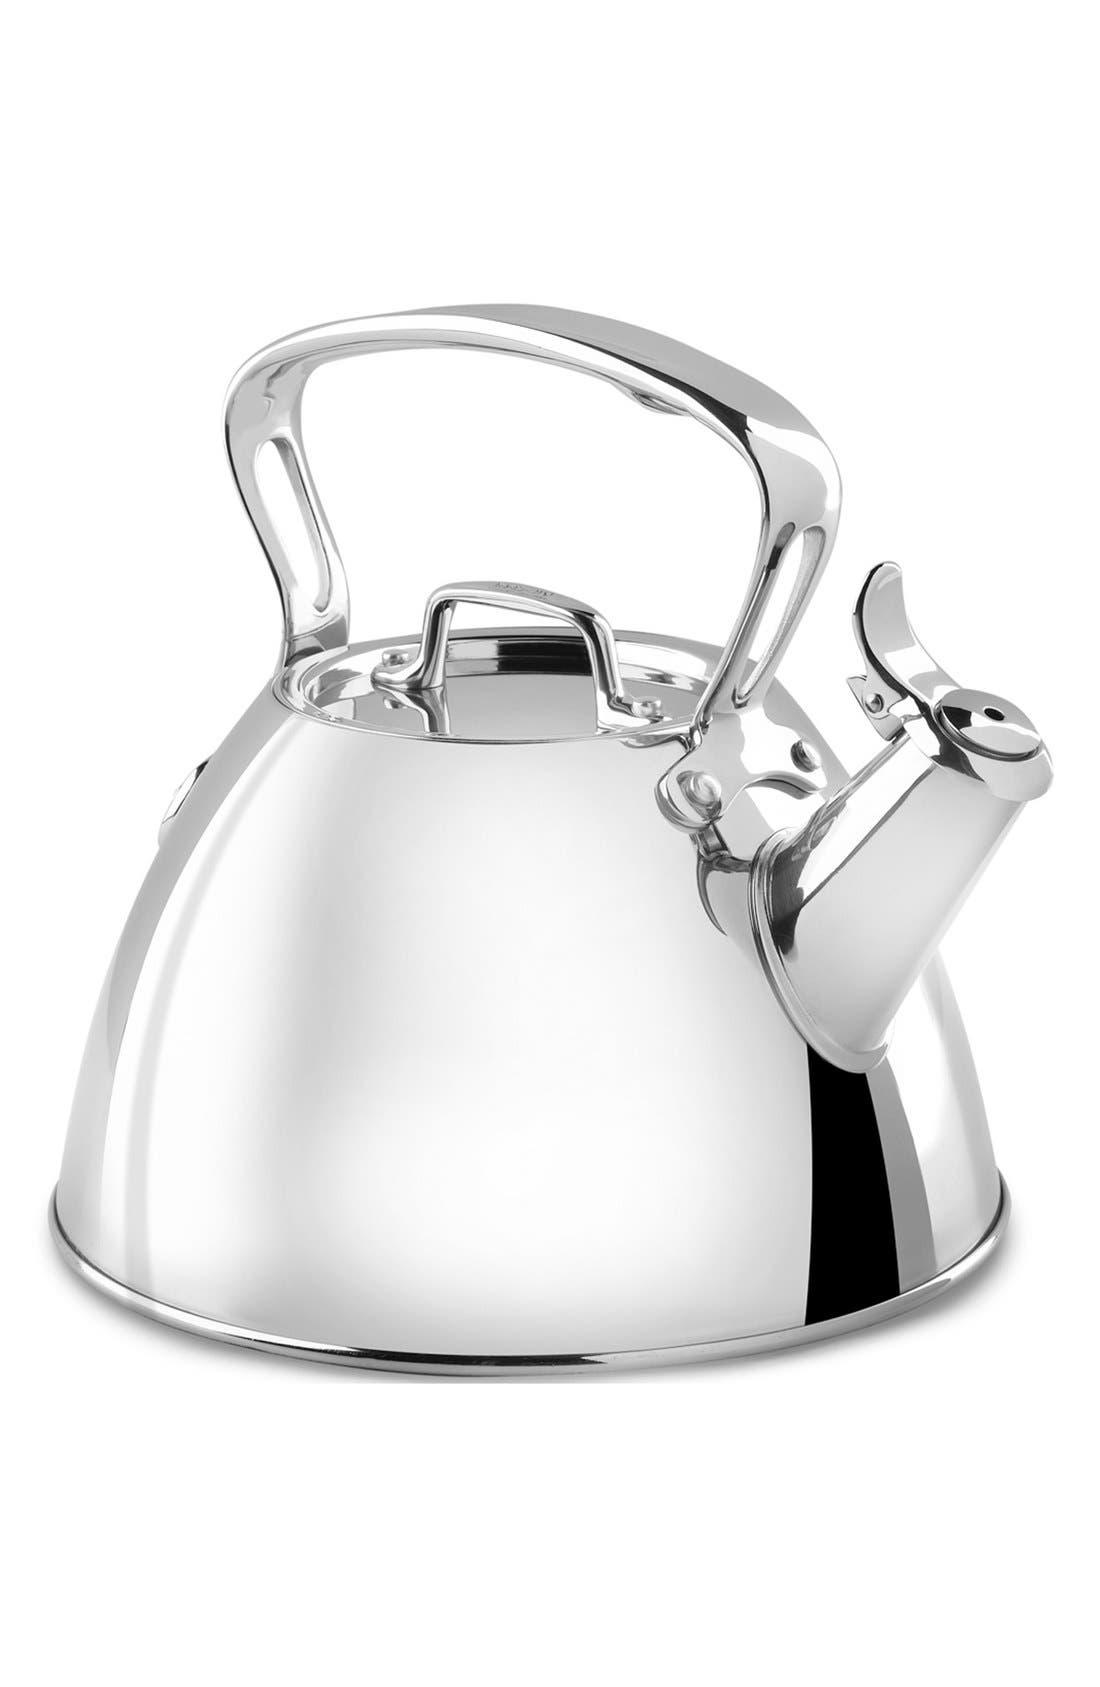 2-Quart Stainless Steel Tea Kettle,                             Main thumbnail 1, color,                             Stainless Steel